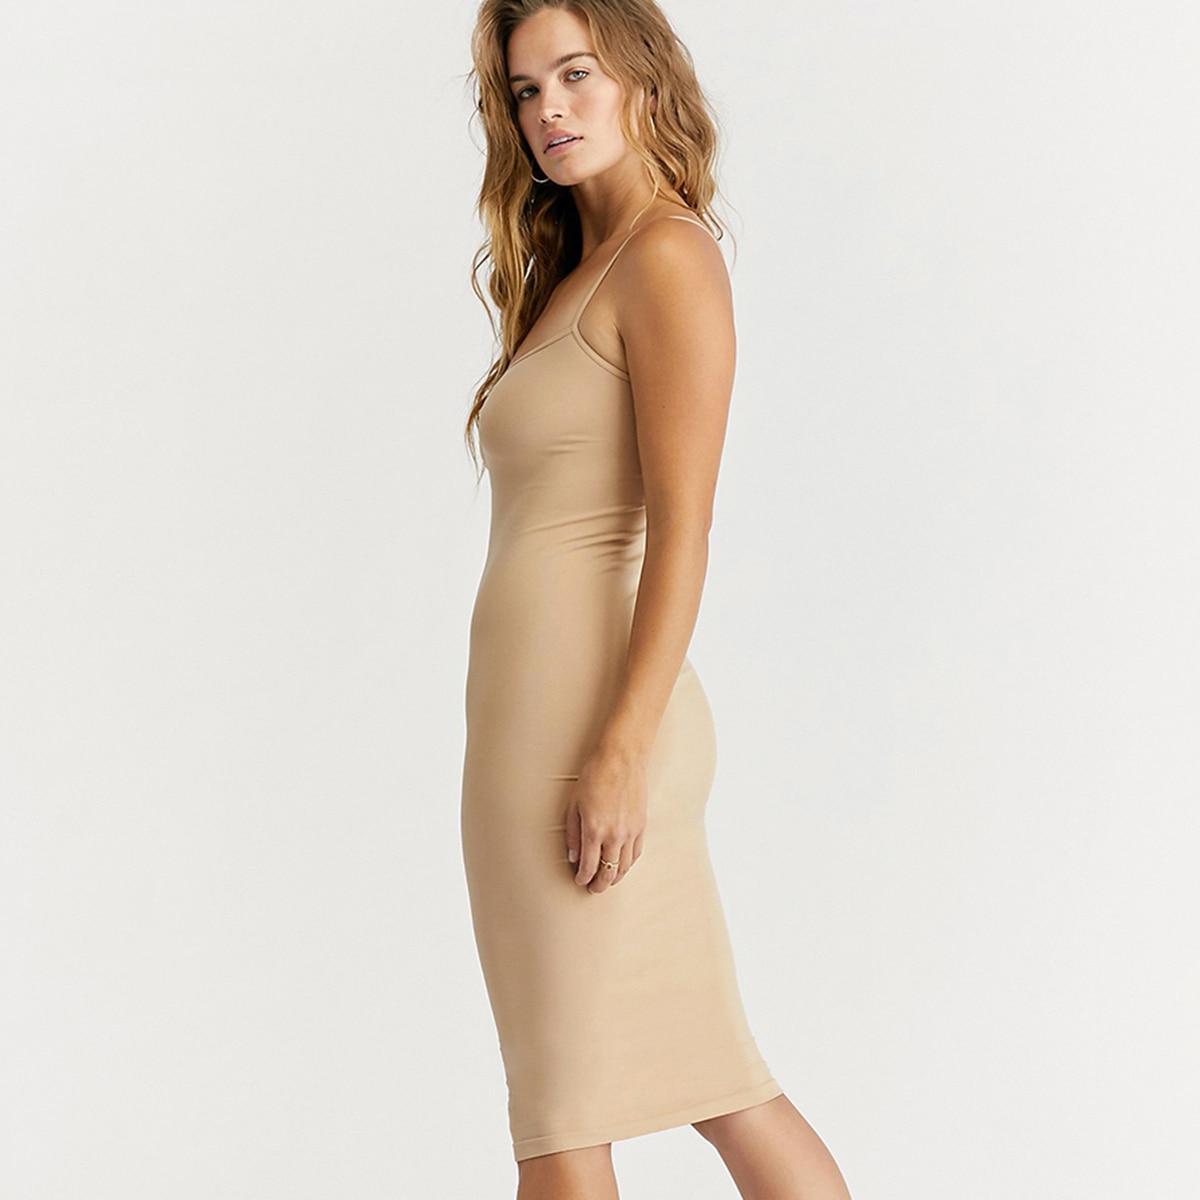 Seamless Nude Slip Dress 2020 Summer Autumn Women Adjustable Strap Sexy Vestidos Stretchy Bodycon Slim Midi Dress Underdress